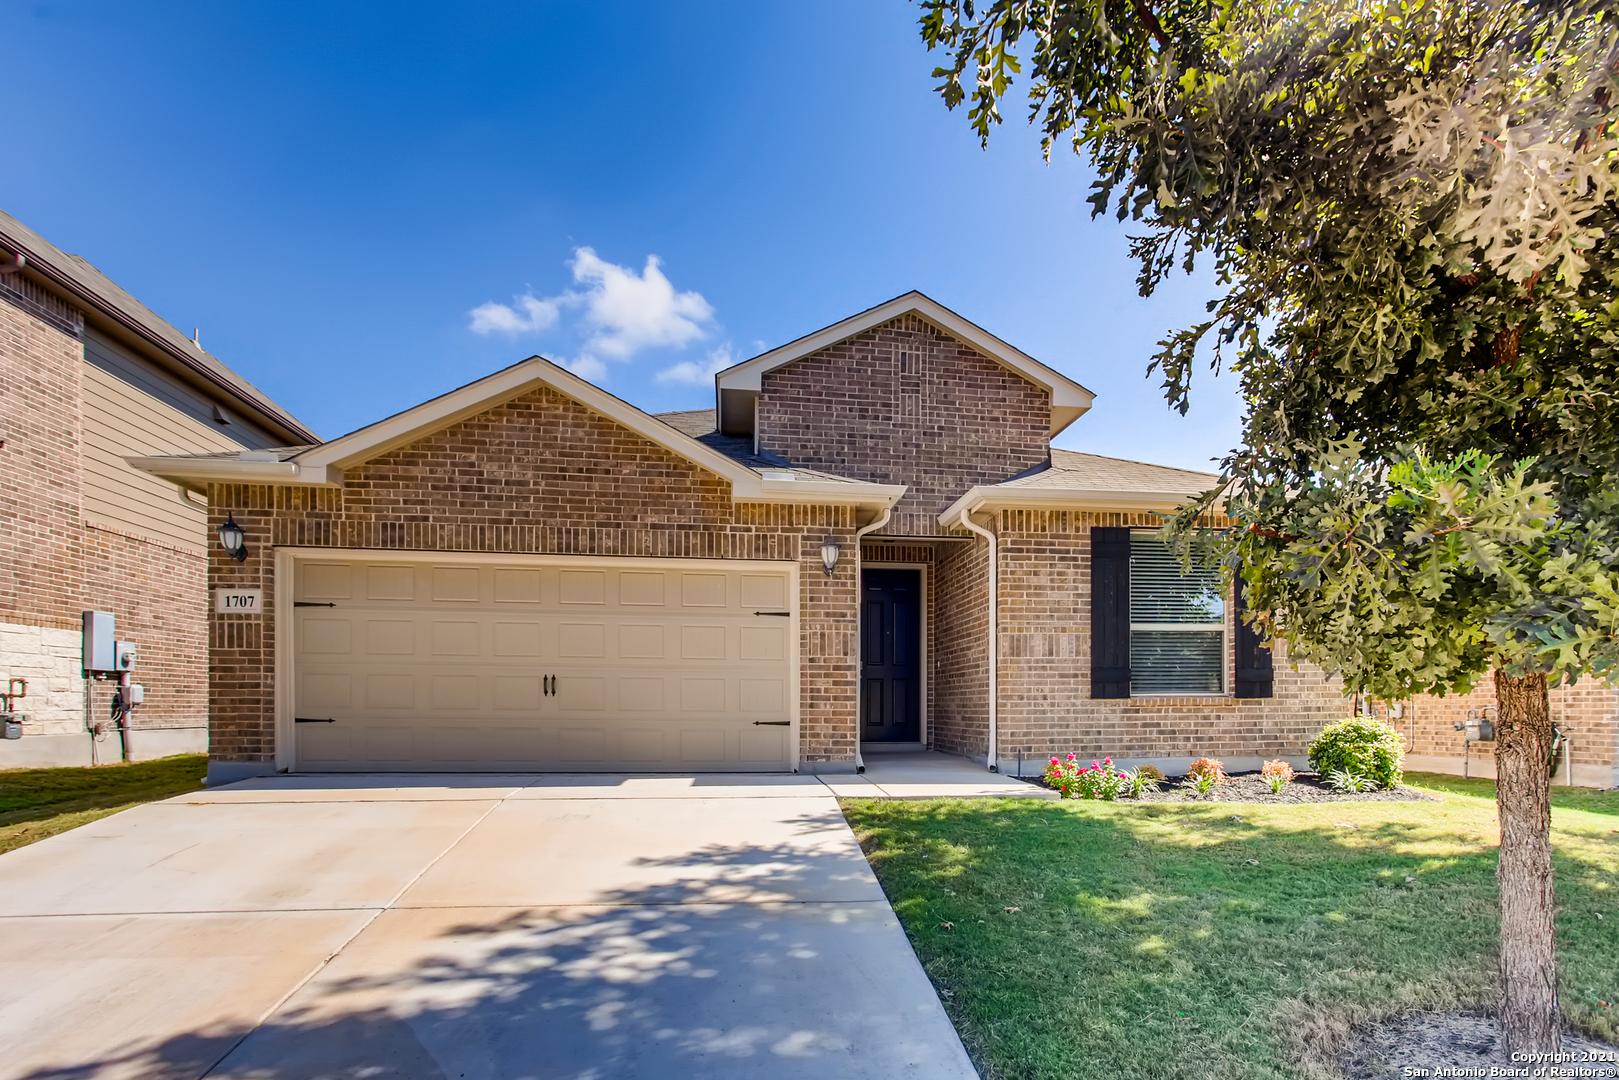 1707 CEDRIC LN, San Antonio, TX 78213